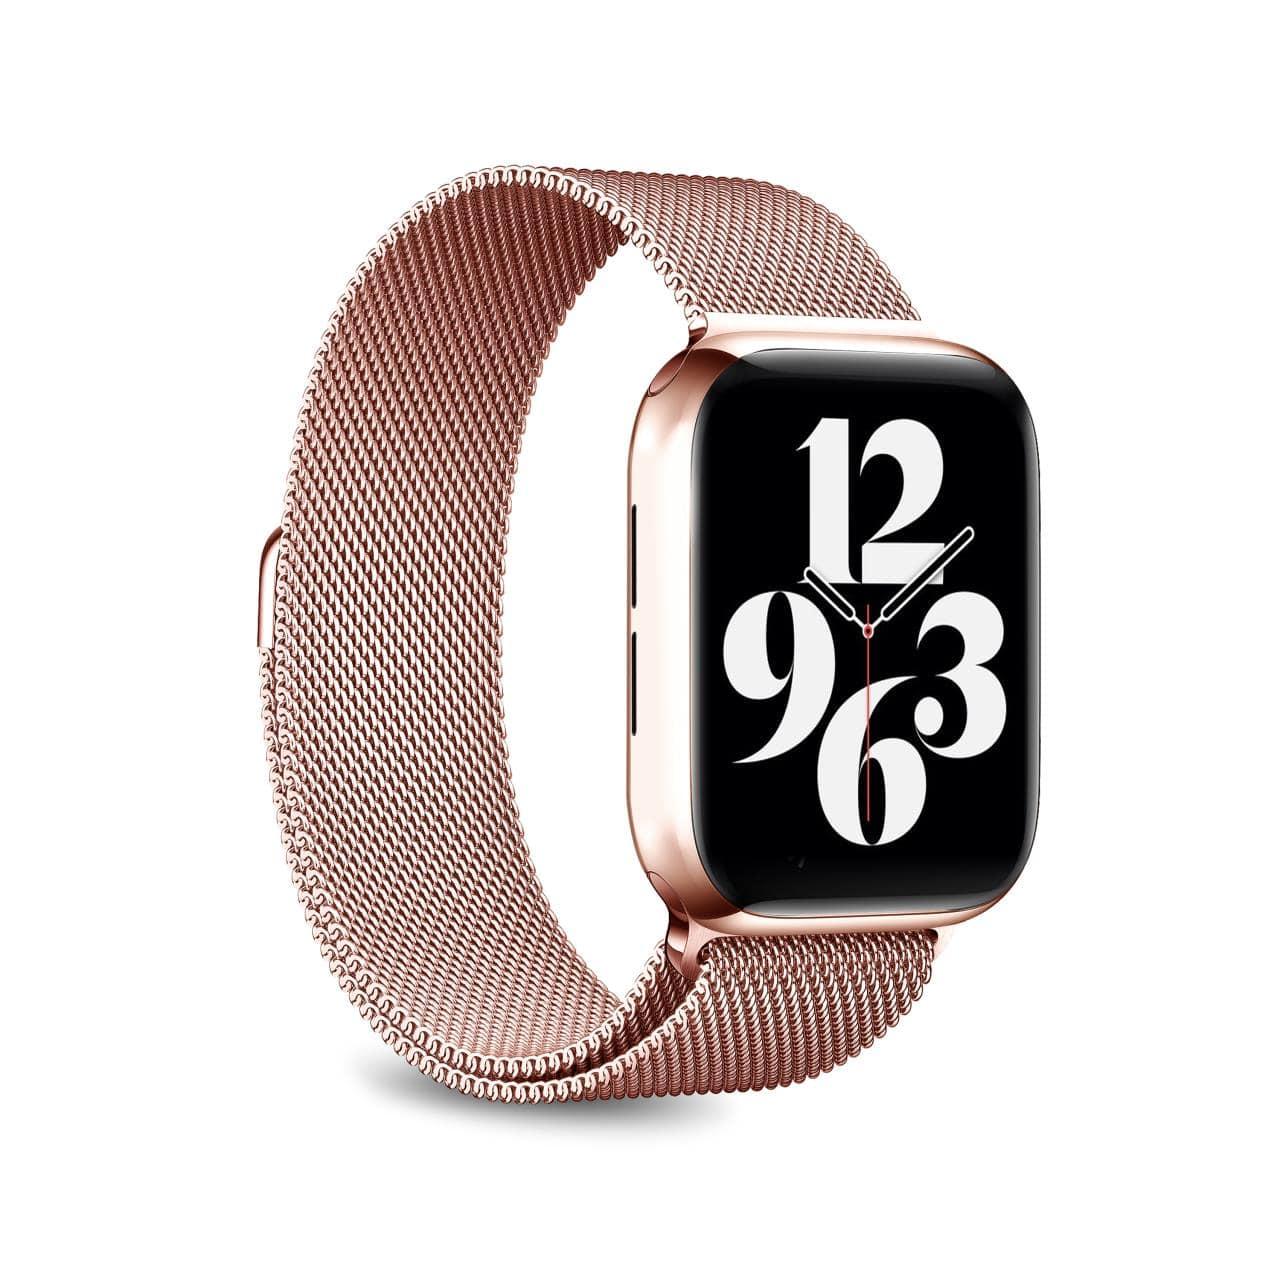 puro-cinturino-milanese-rosa-per-apple-atch-cassa-40mm_01-min